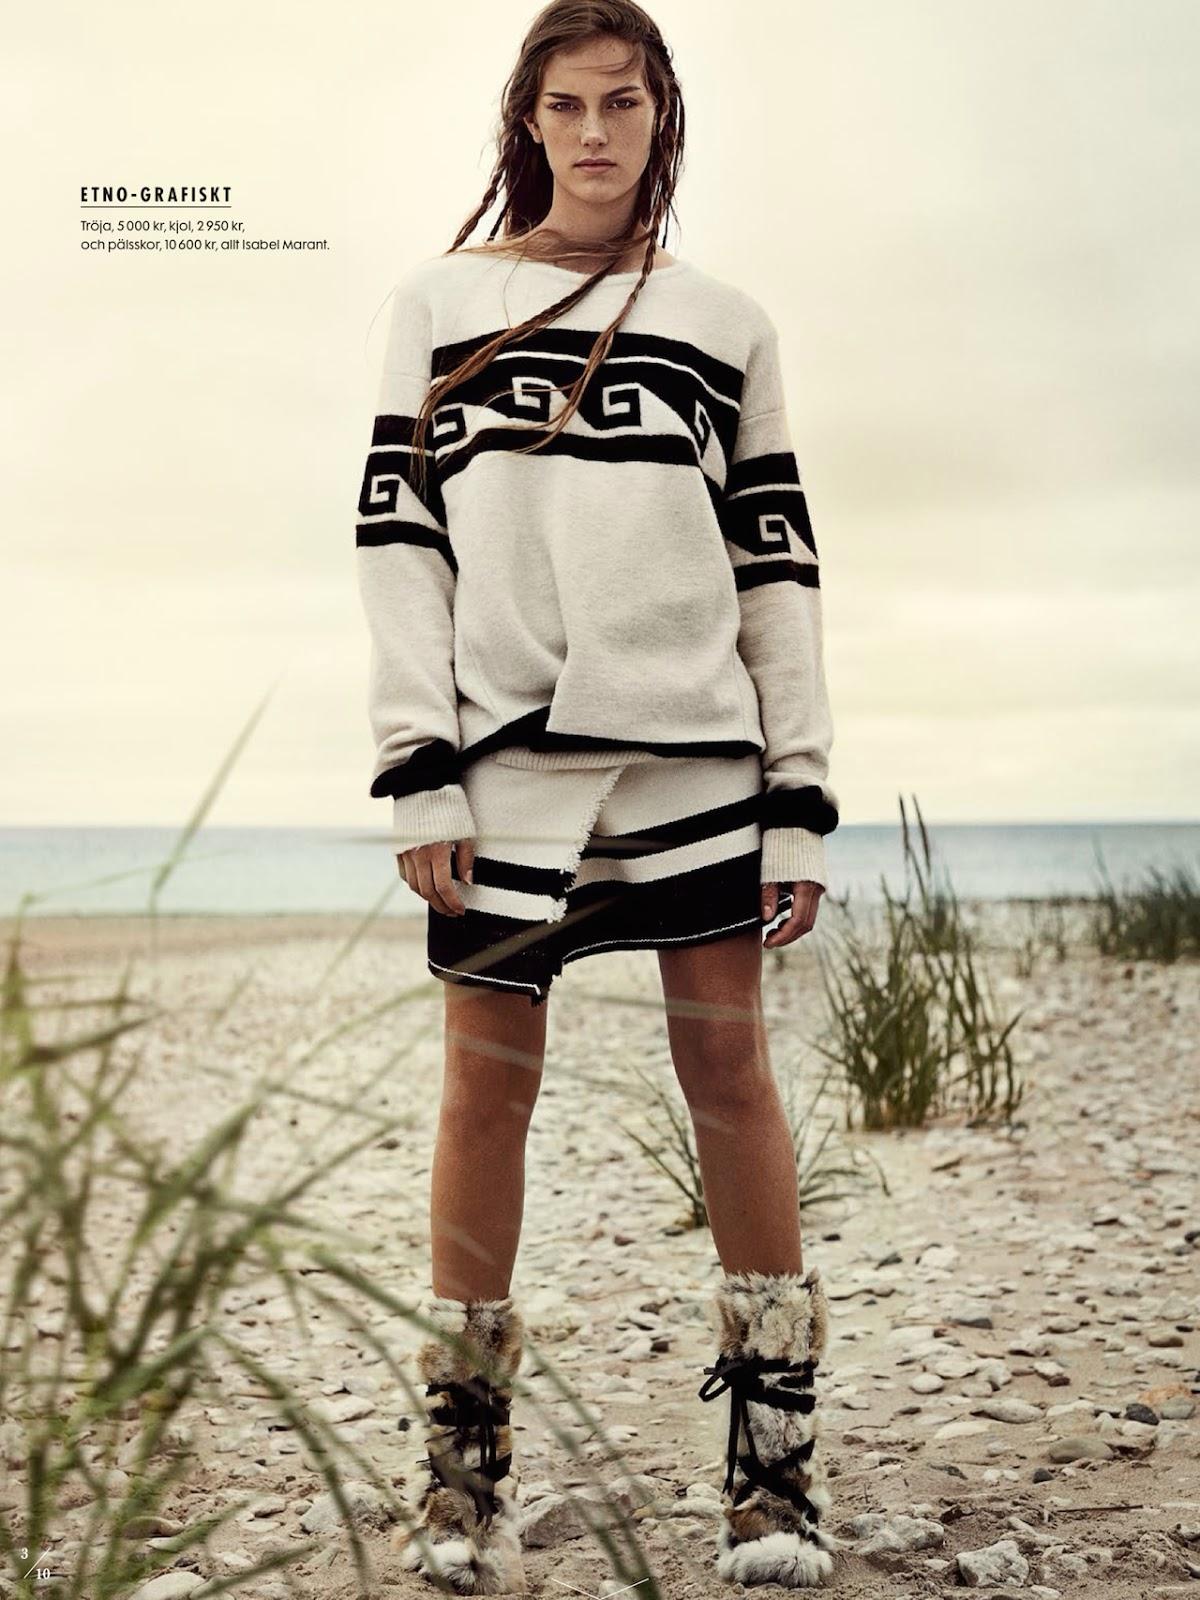 Naturbarn - model Stina Olsson